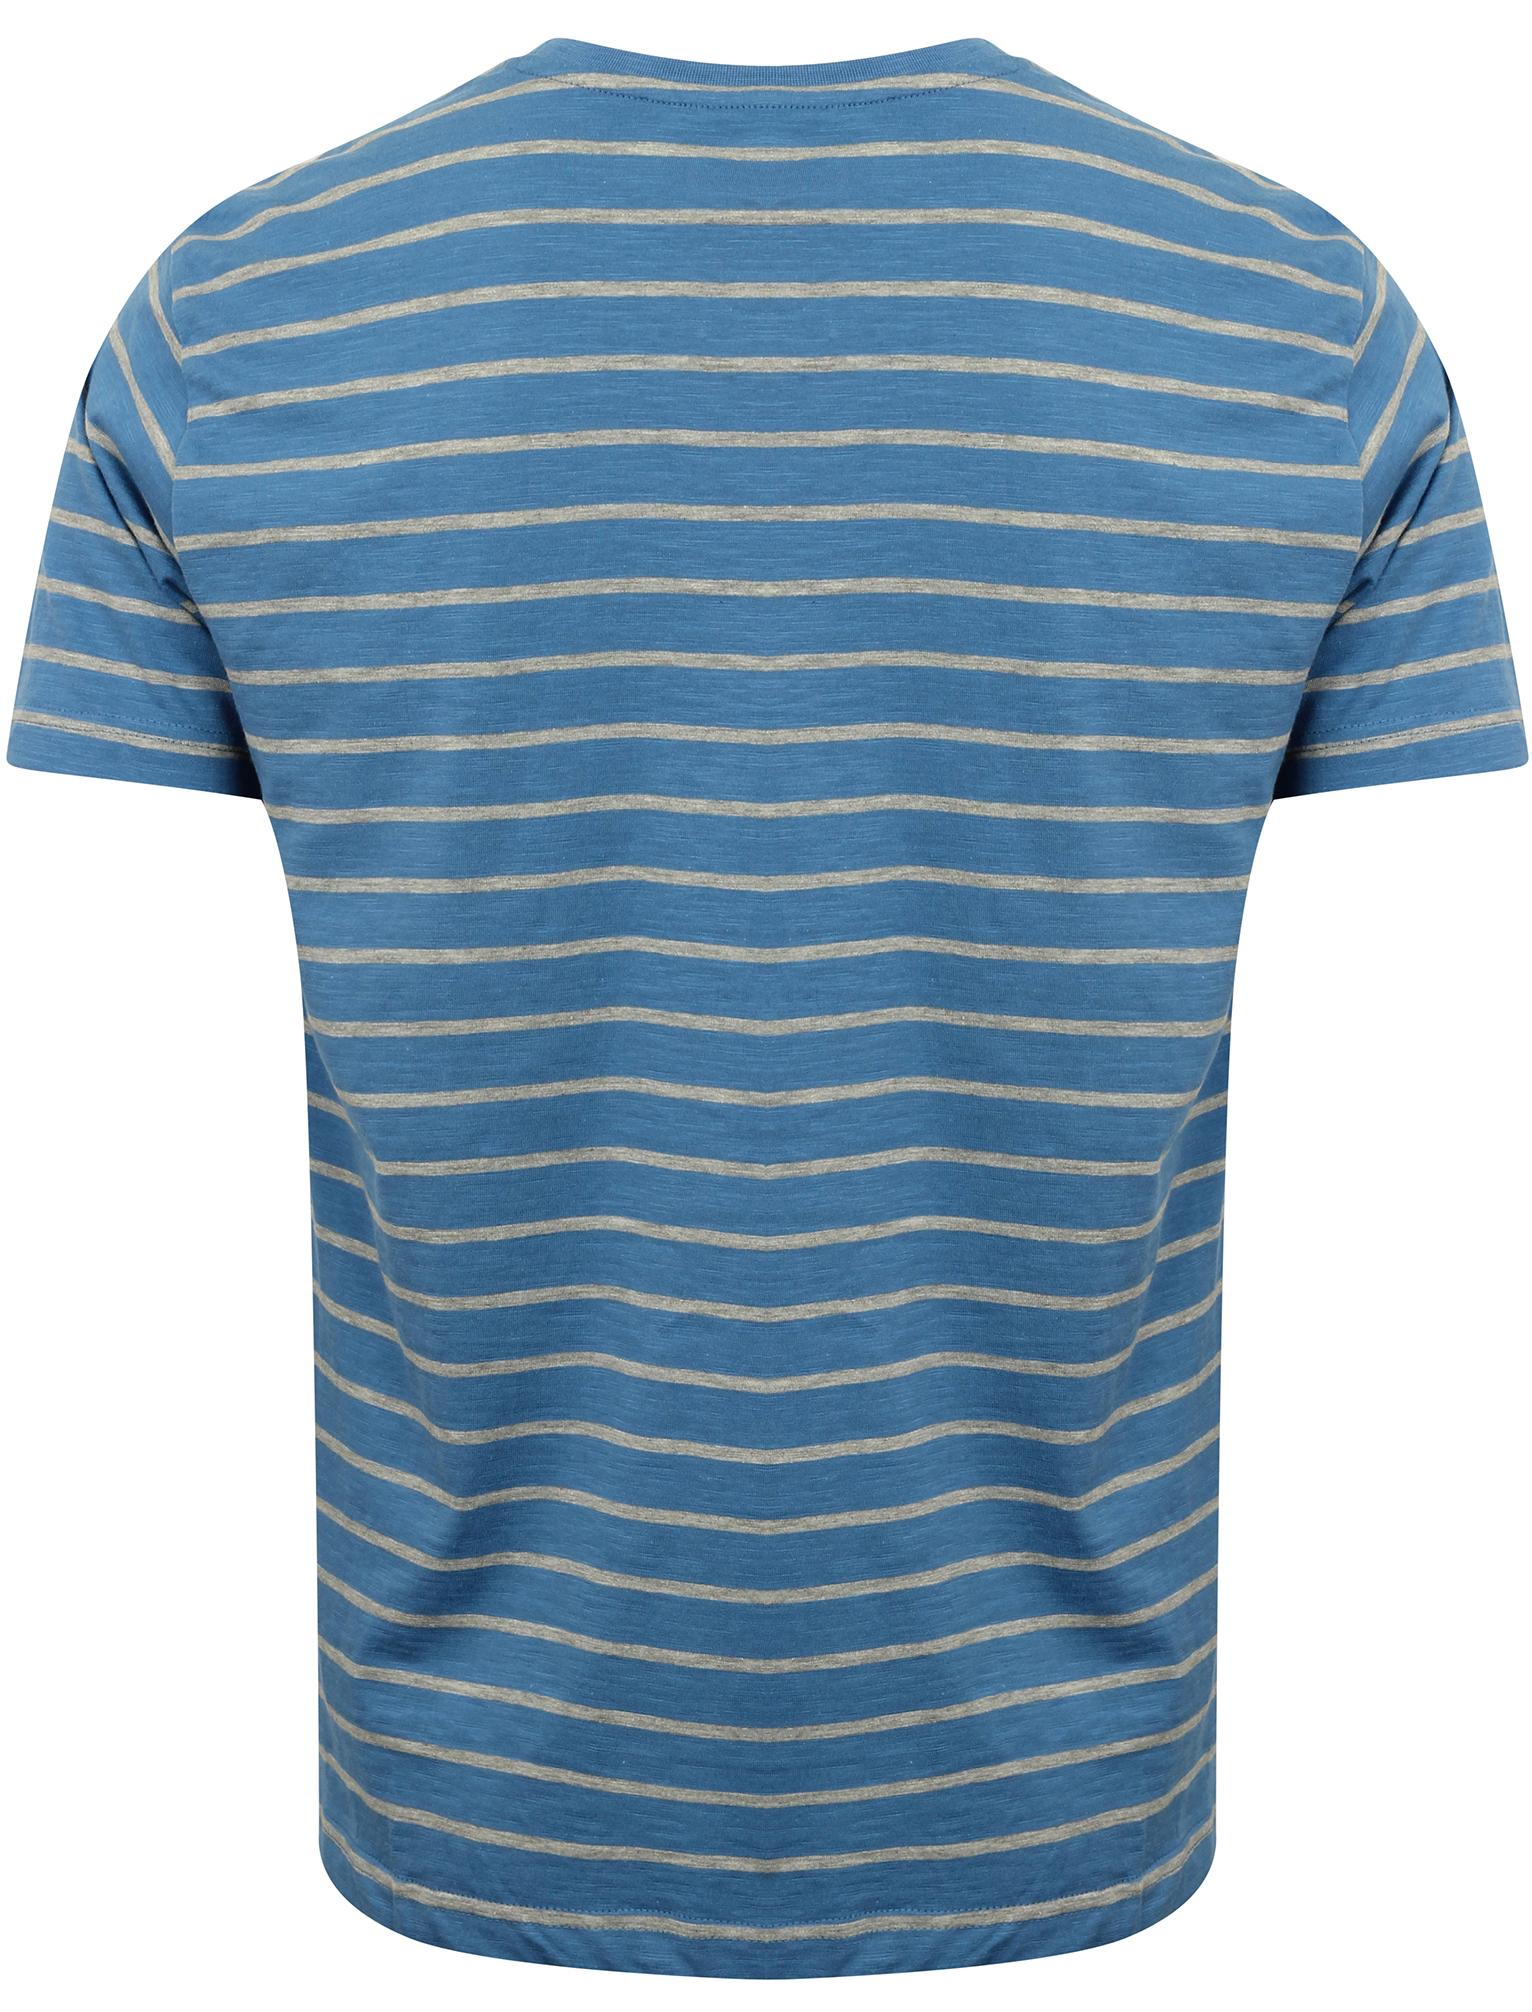 Tokyo-Laundry-Men-039-s-Gough-Cotton-Short-Sleeve-Pyjamas-PJ-Shorts-Lounge-Wear-Set thumbnail 9